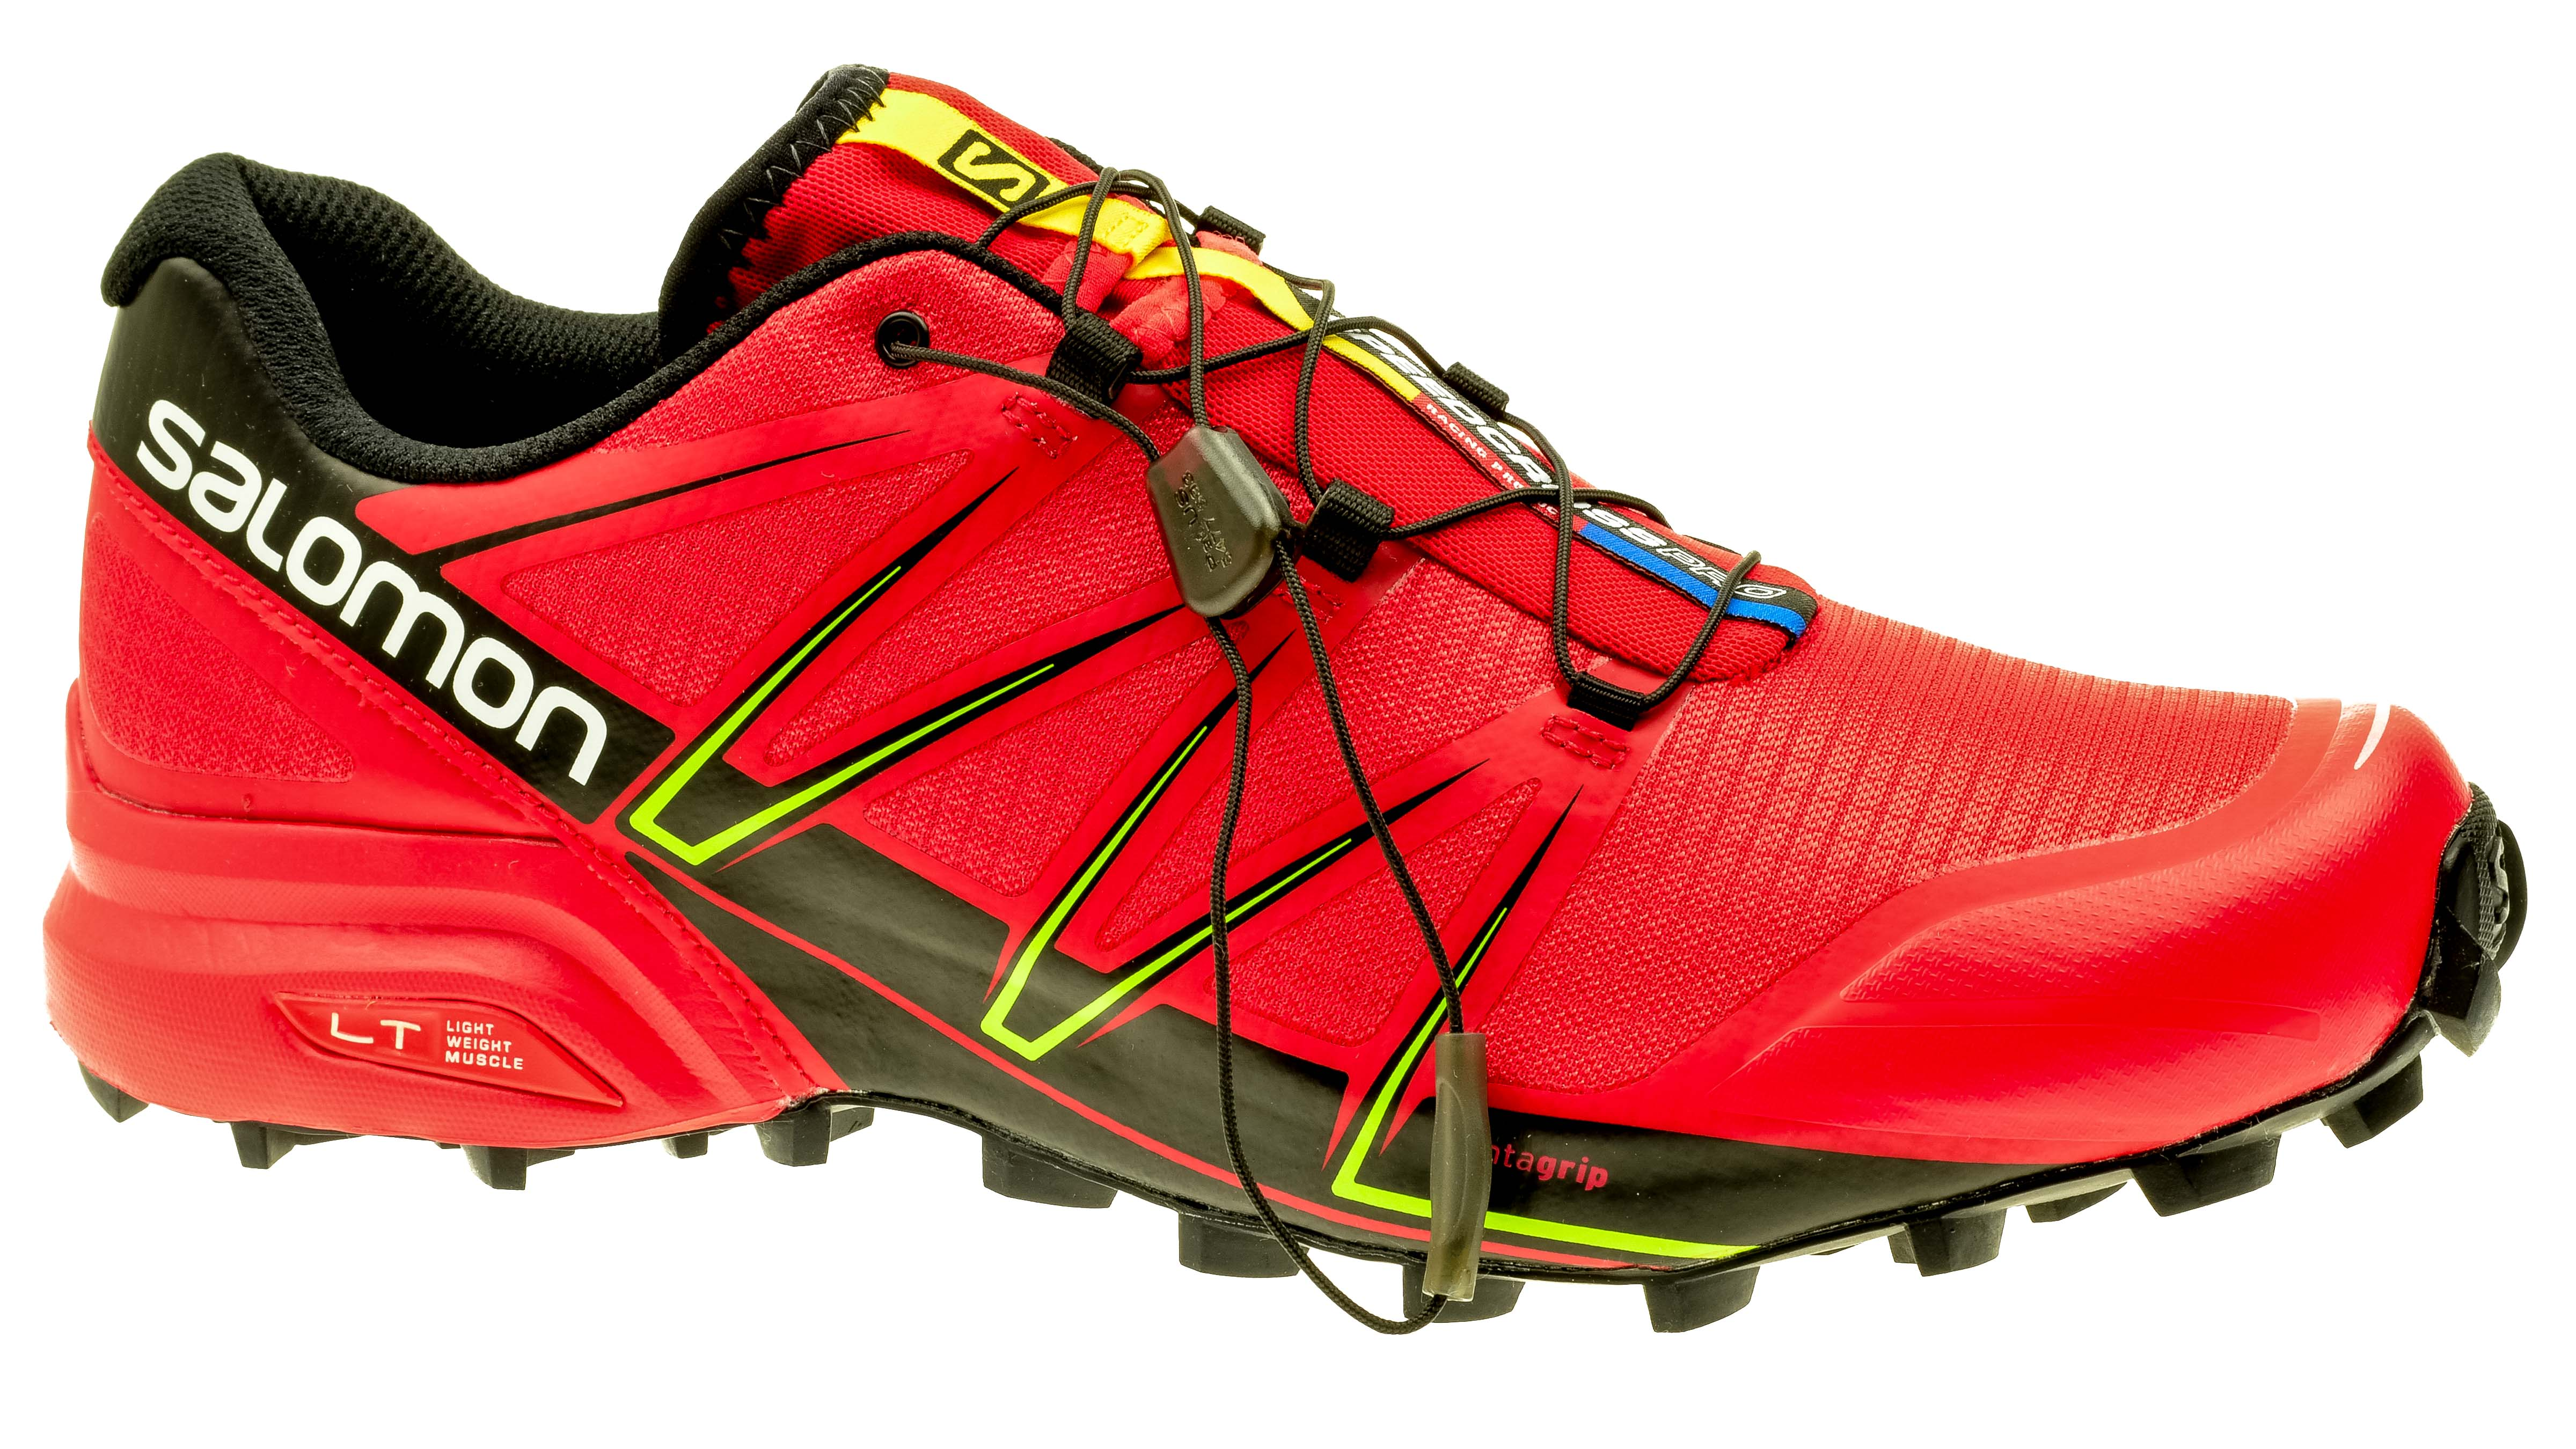 best sneakers dc61c 66301 Salomon Speedcross PRO radiant-red/black/gecko-green